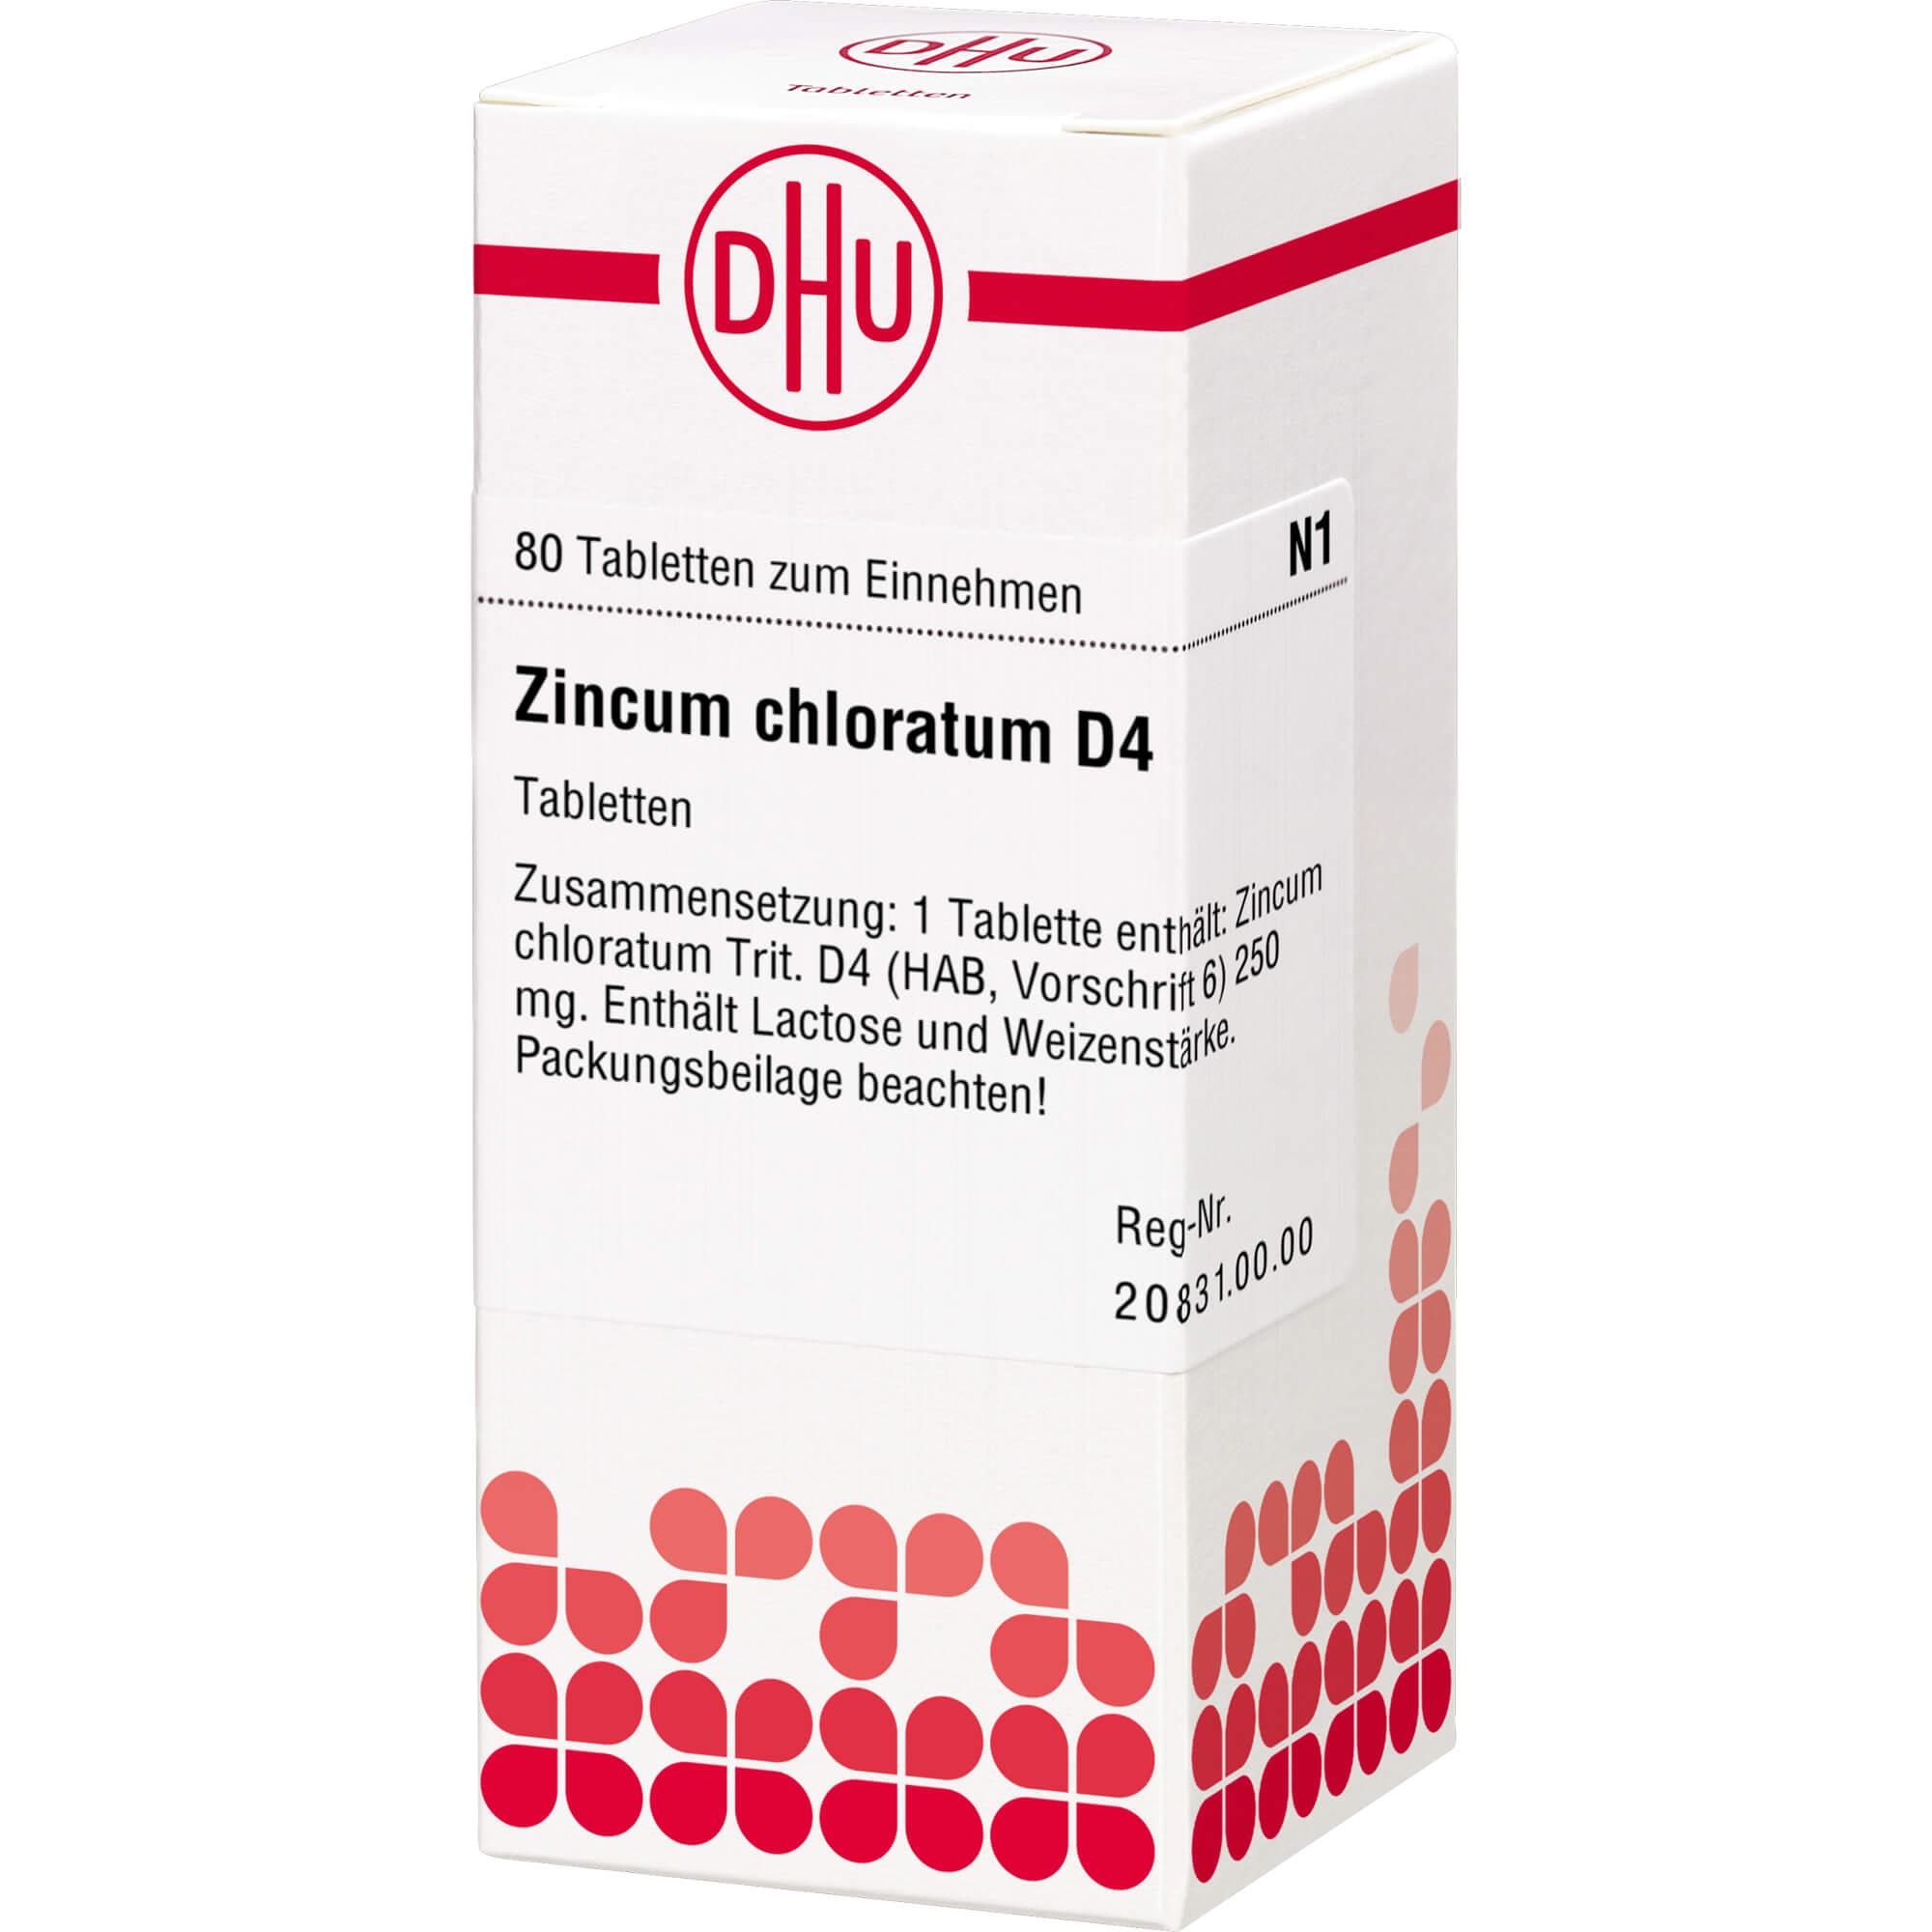 ZINCUM CHLORATUM D 4 Tabletten